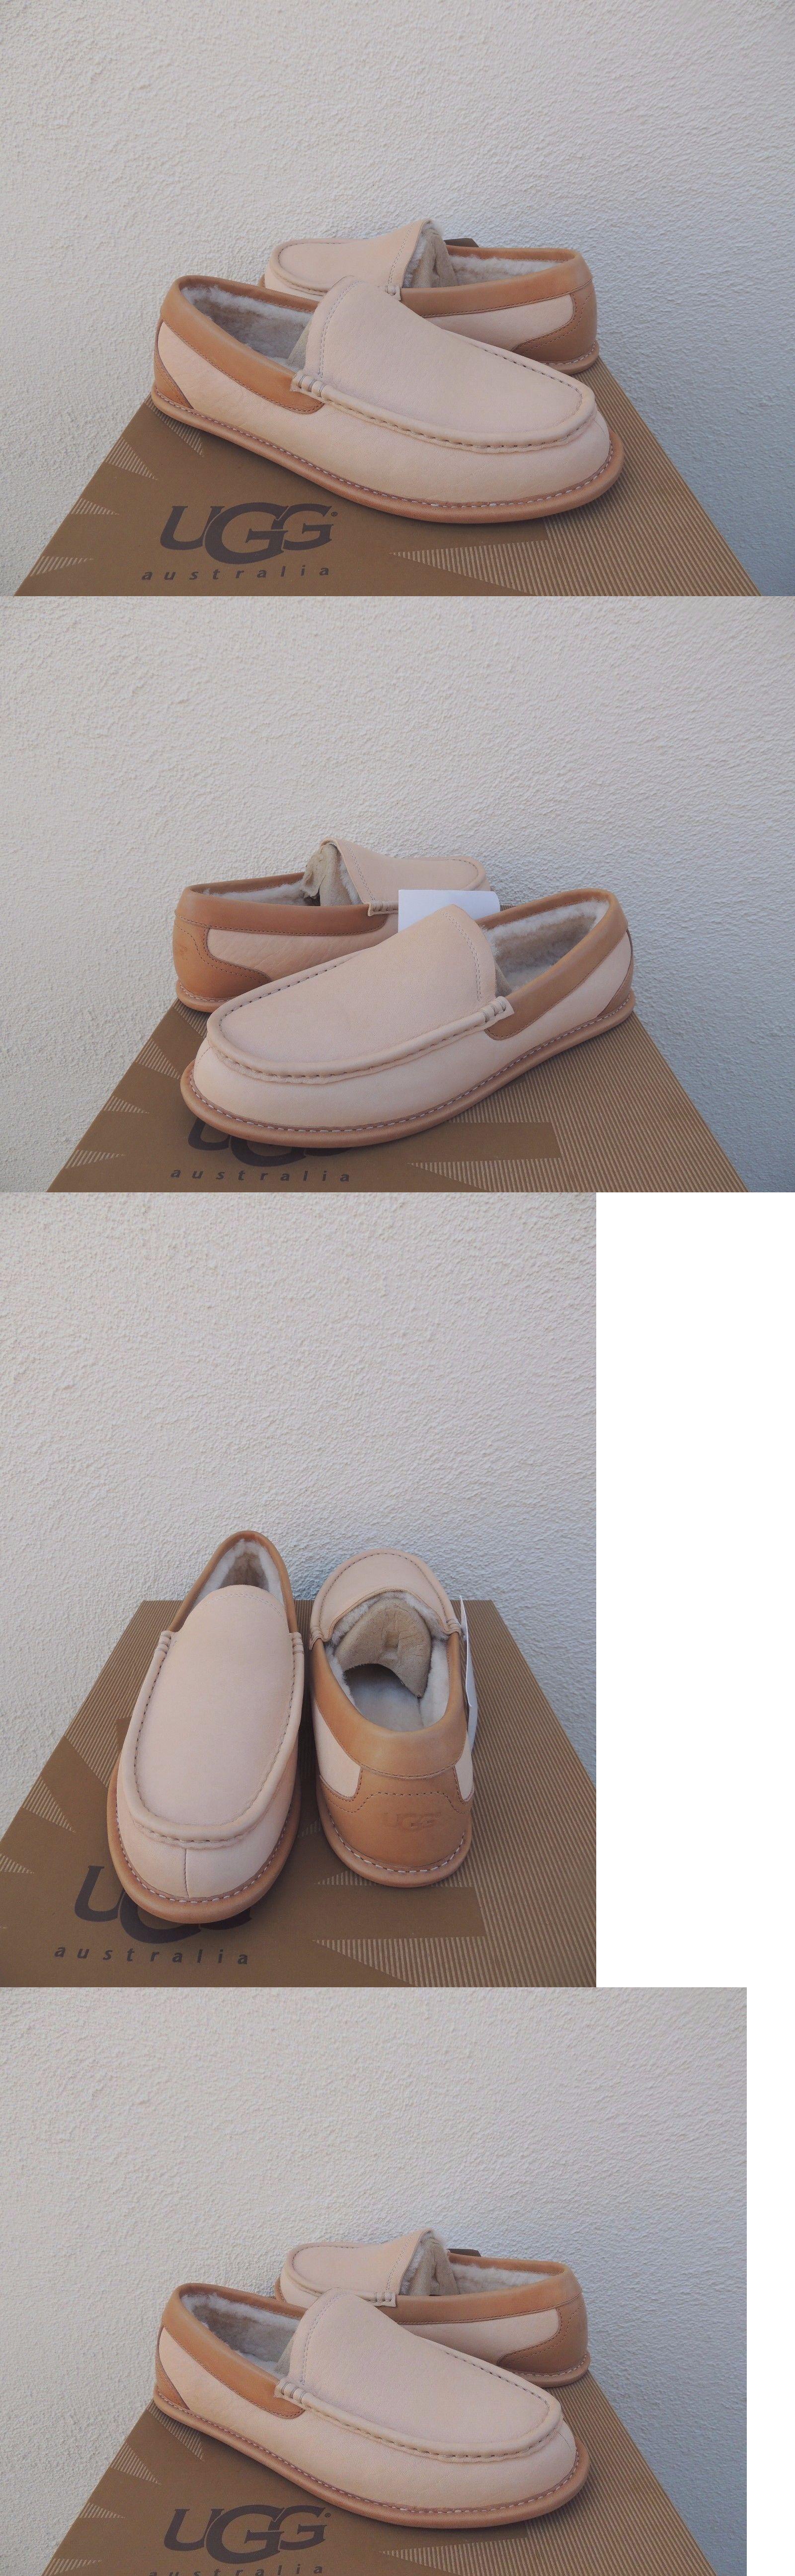 b9ebd88b0dd Slippers 11505: Ugg Lorne 1978 Collection Leather Sheepskin Slippers ...